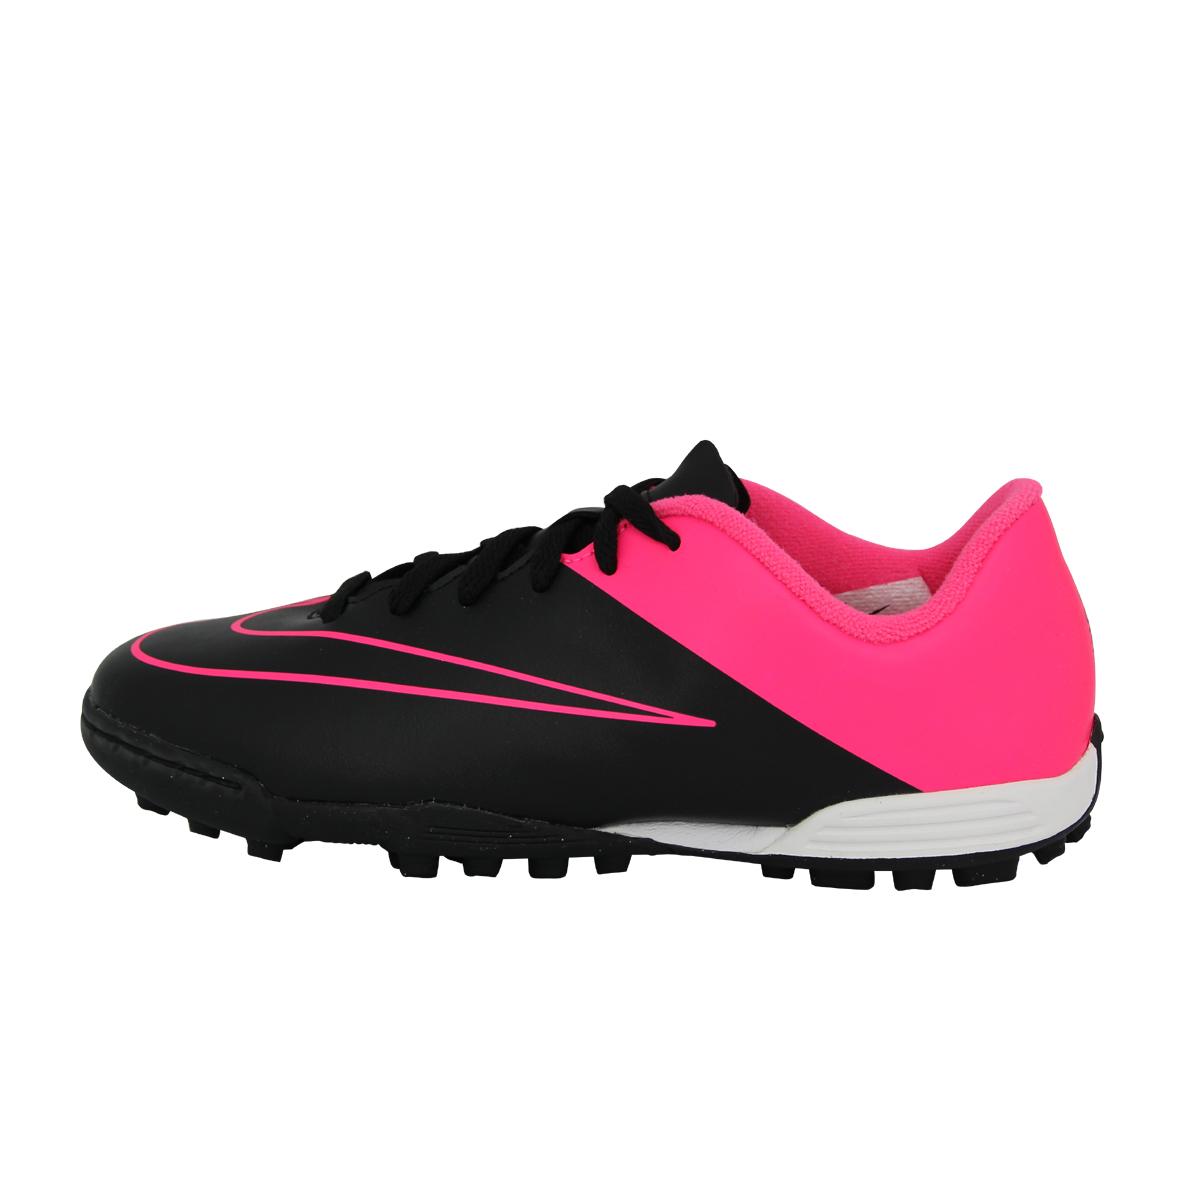 NIKE JR MERCURIAL VORTEX II TF Chaussures de Football Fille